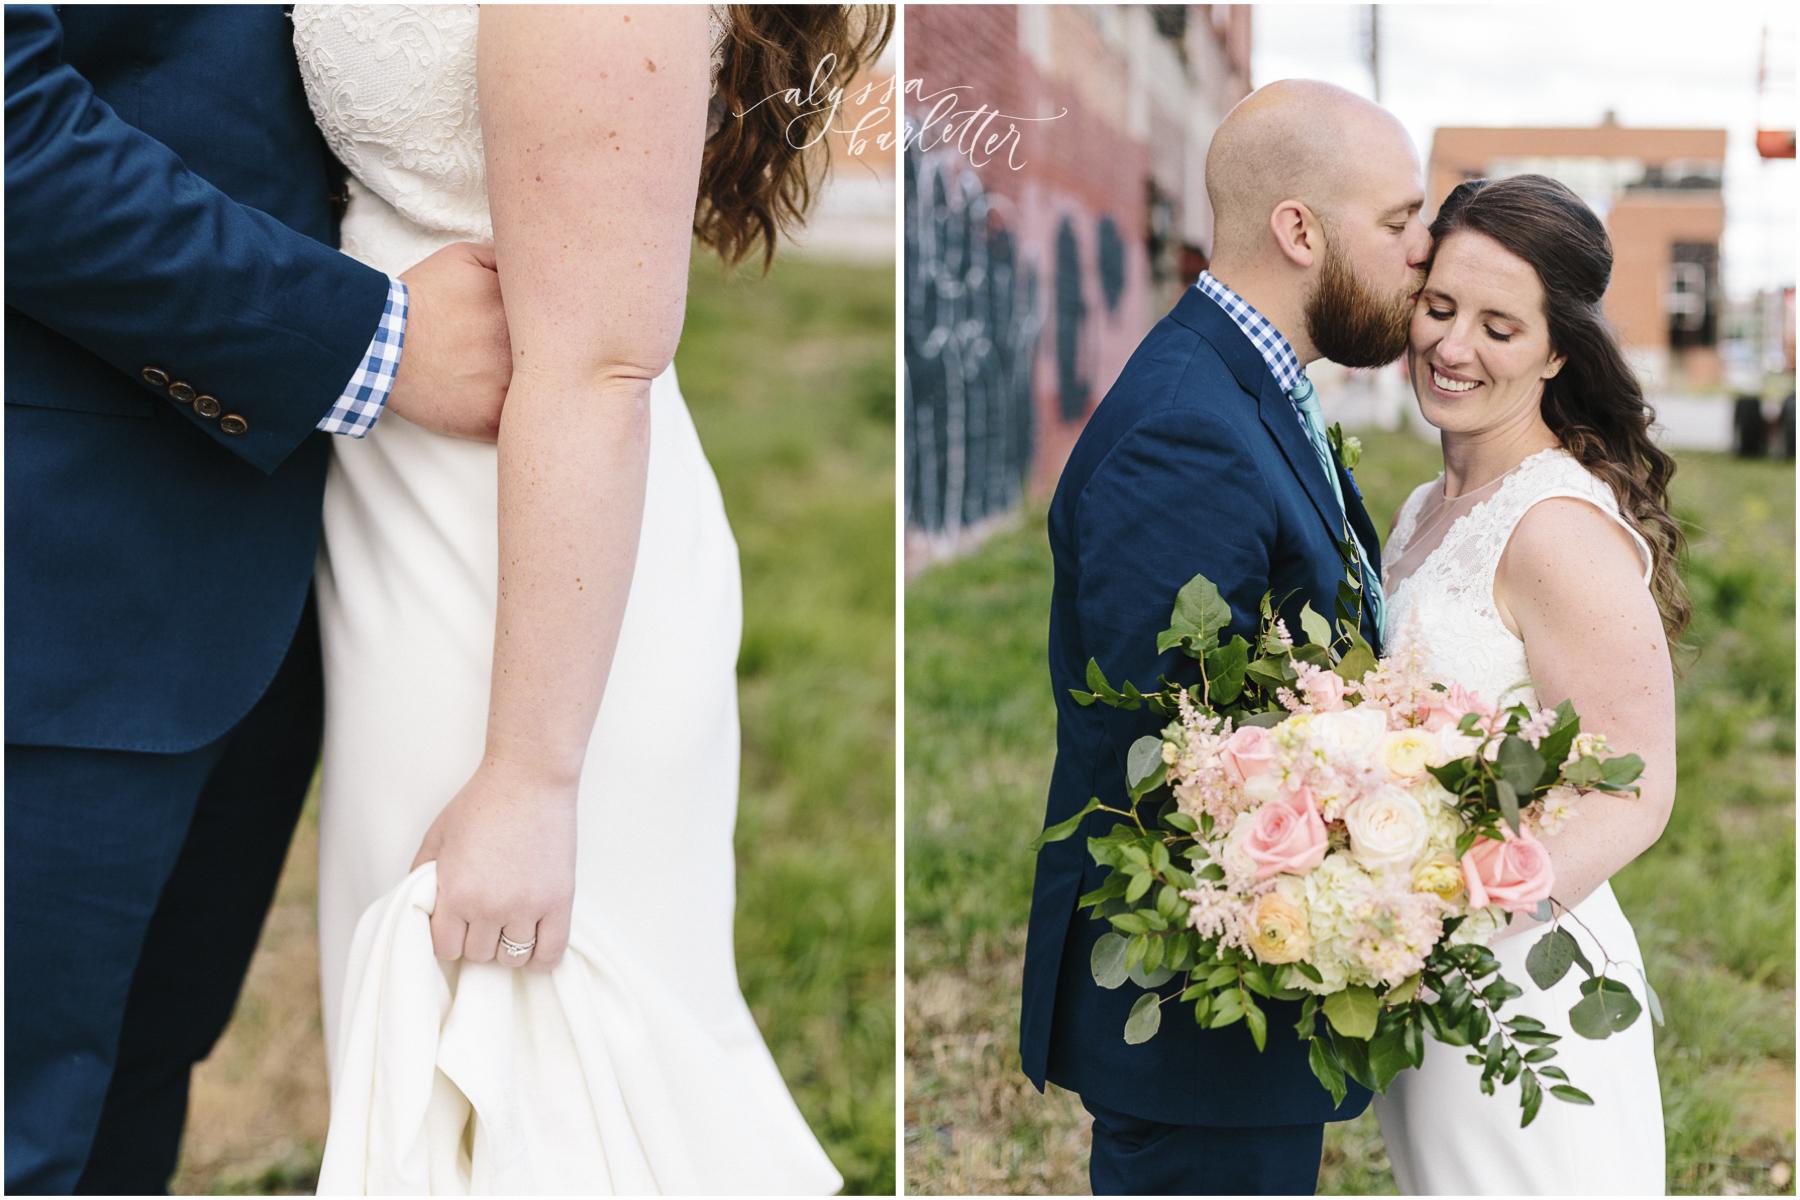 alyssa barletter photography kansas city wedding 2016 main courtney and brian-1-37.jpg